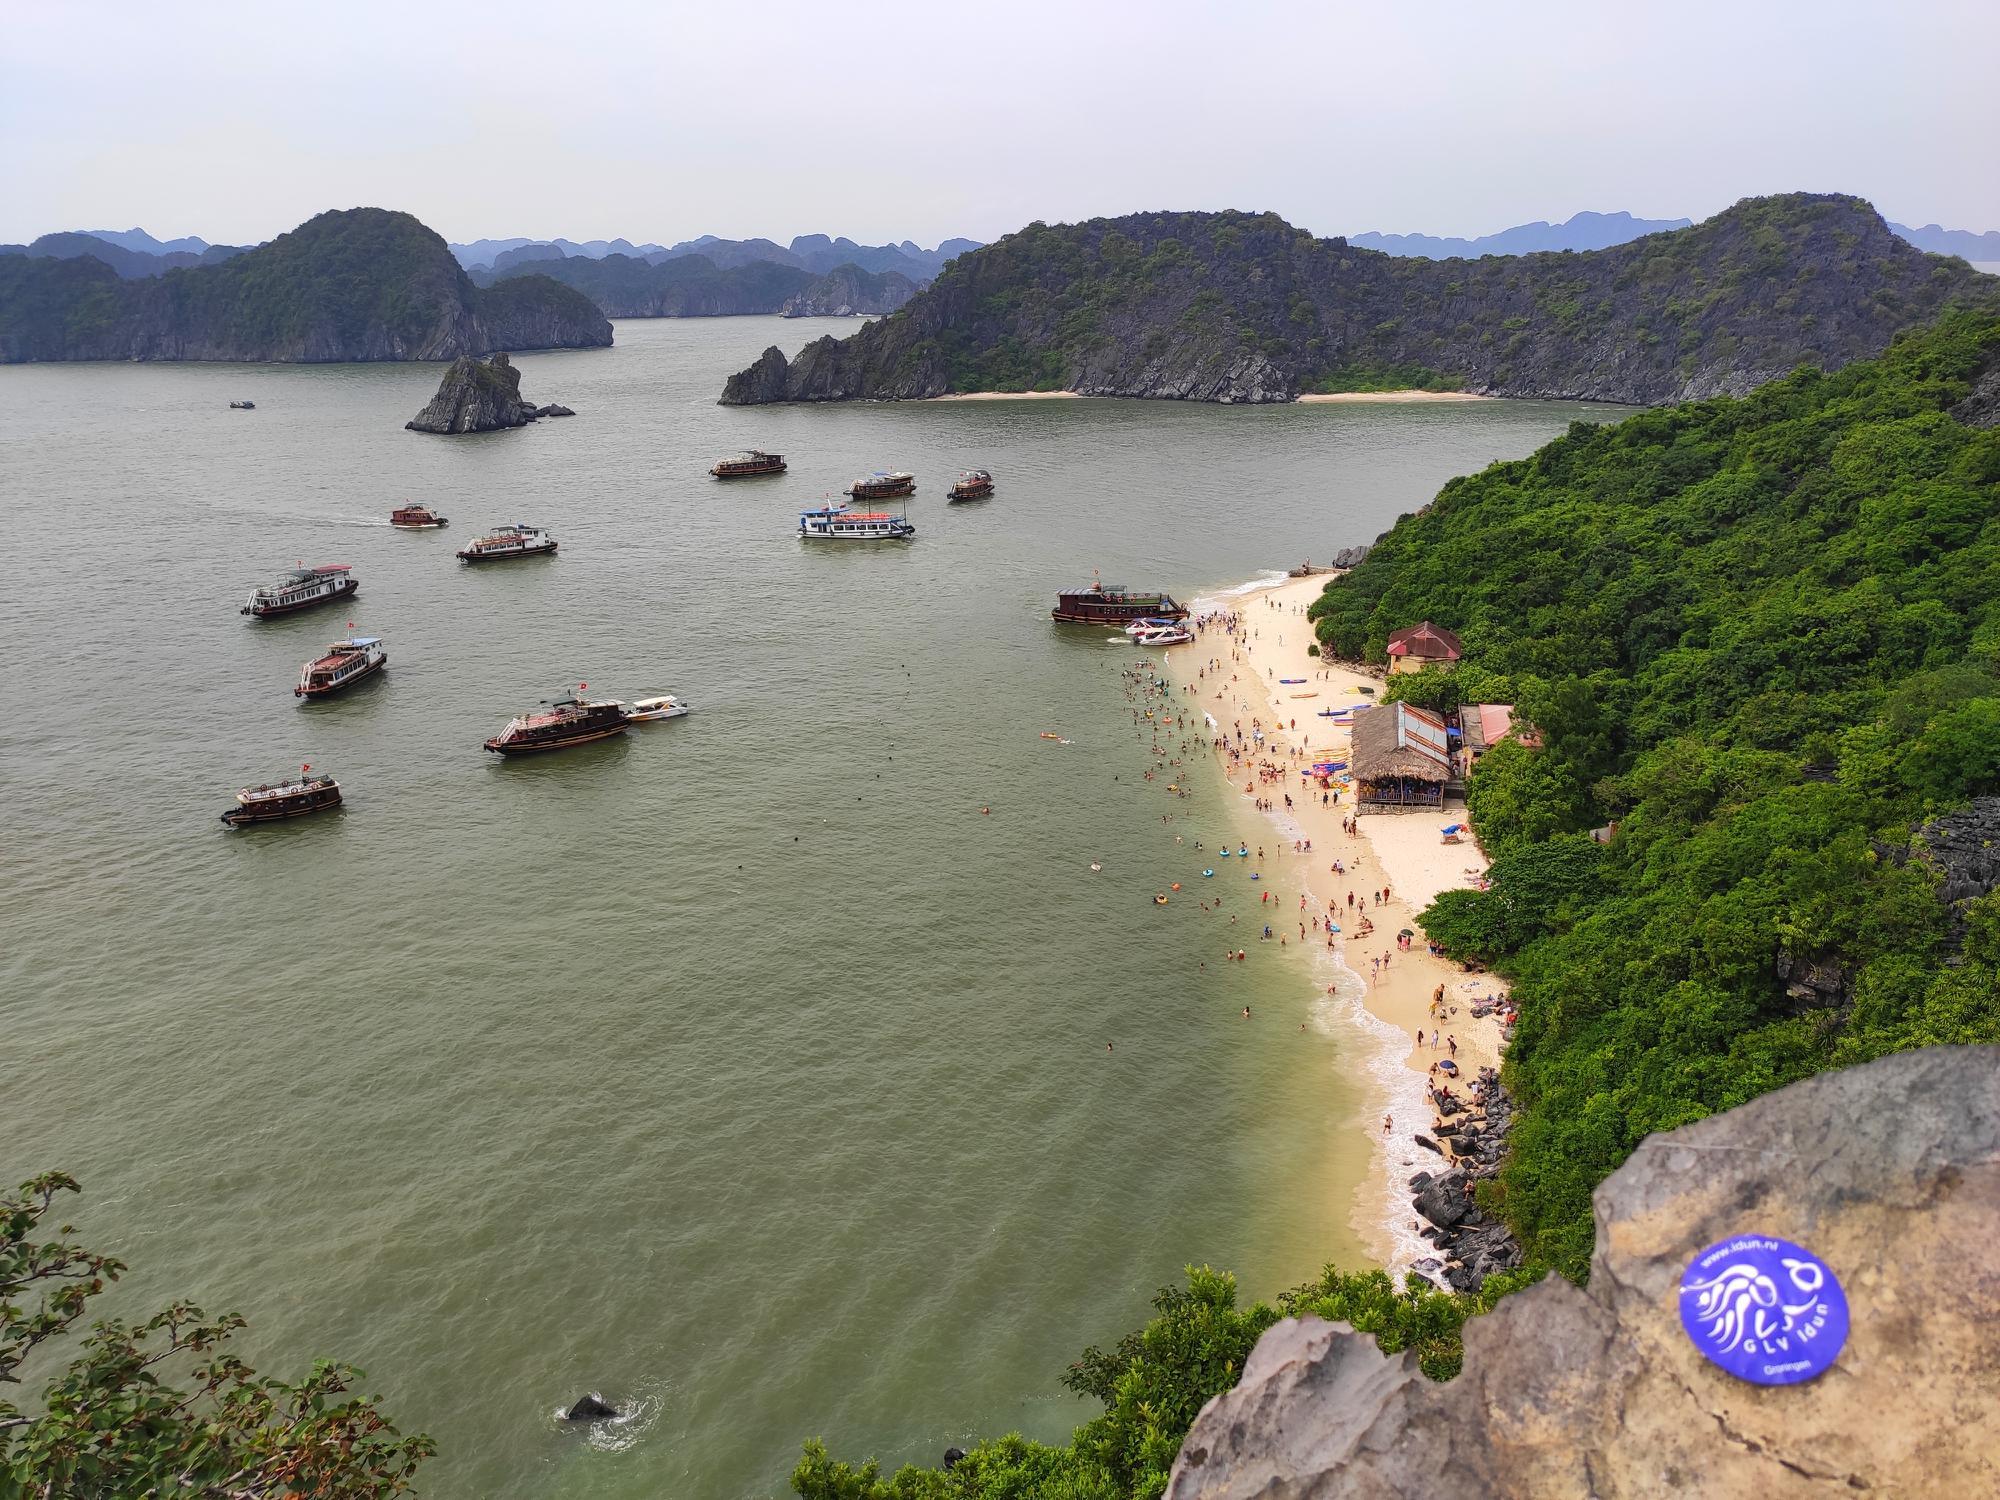 Ha_Long_Bay_Vietnam_-_8837_km_-_Esmee_Castermans.jpg